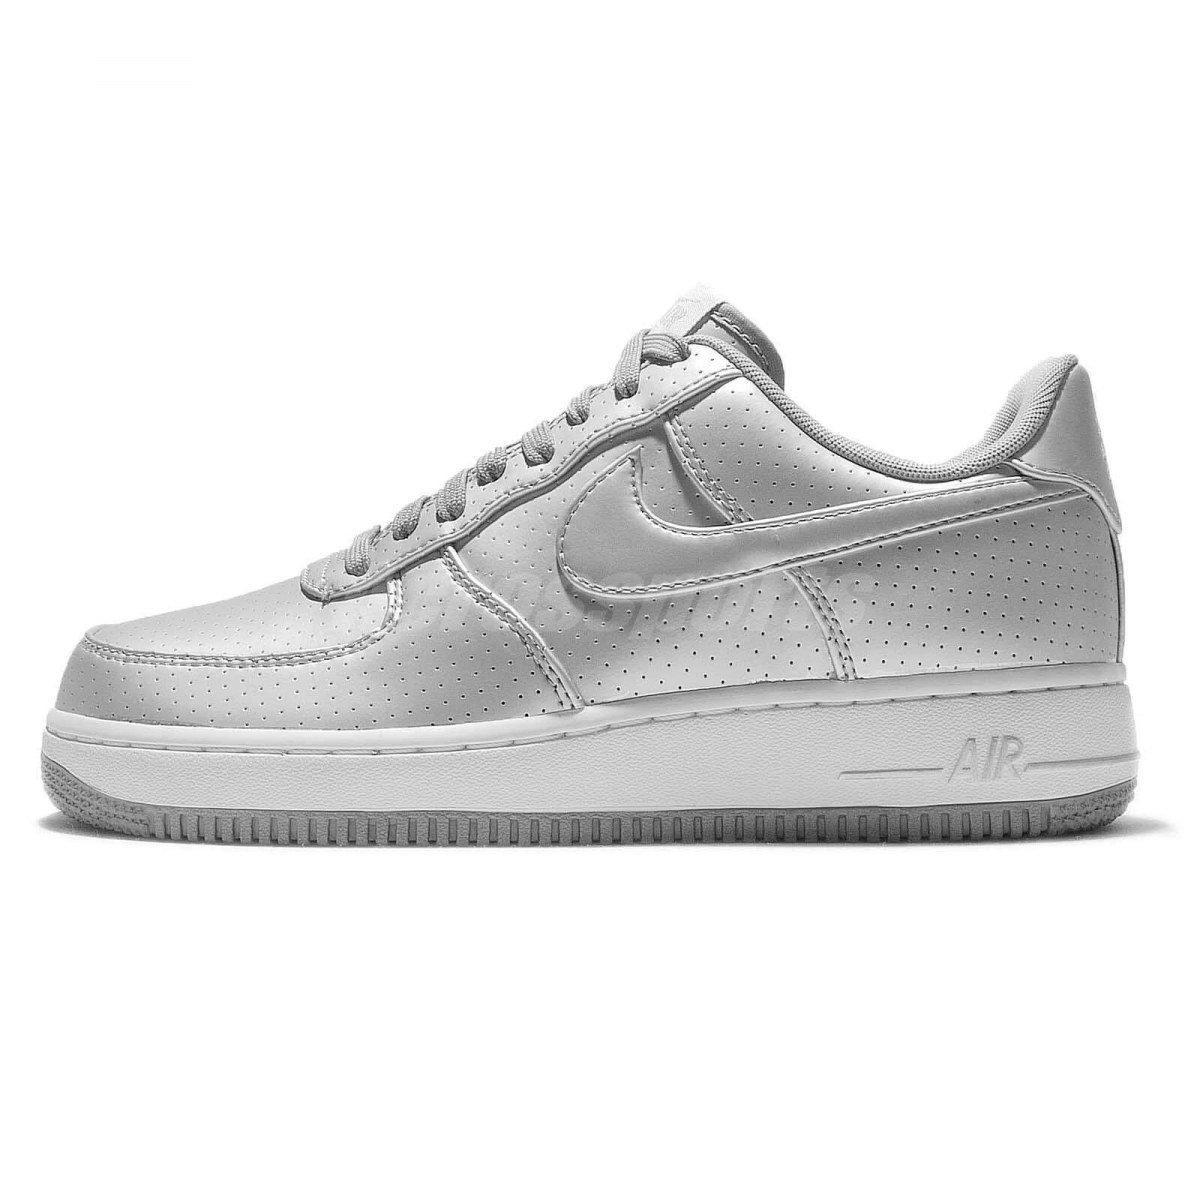 Женские кроссовки Nike Air Force 1 07 LV8